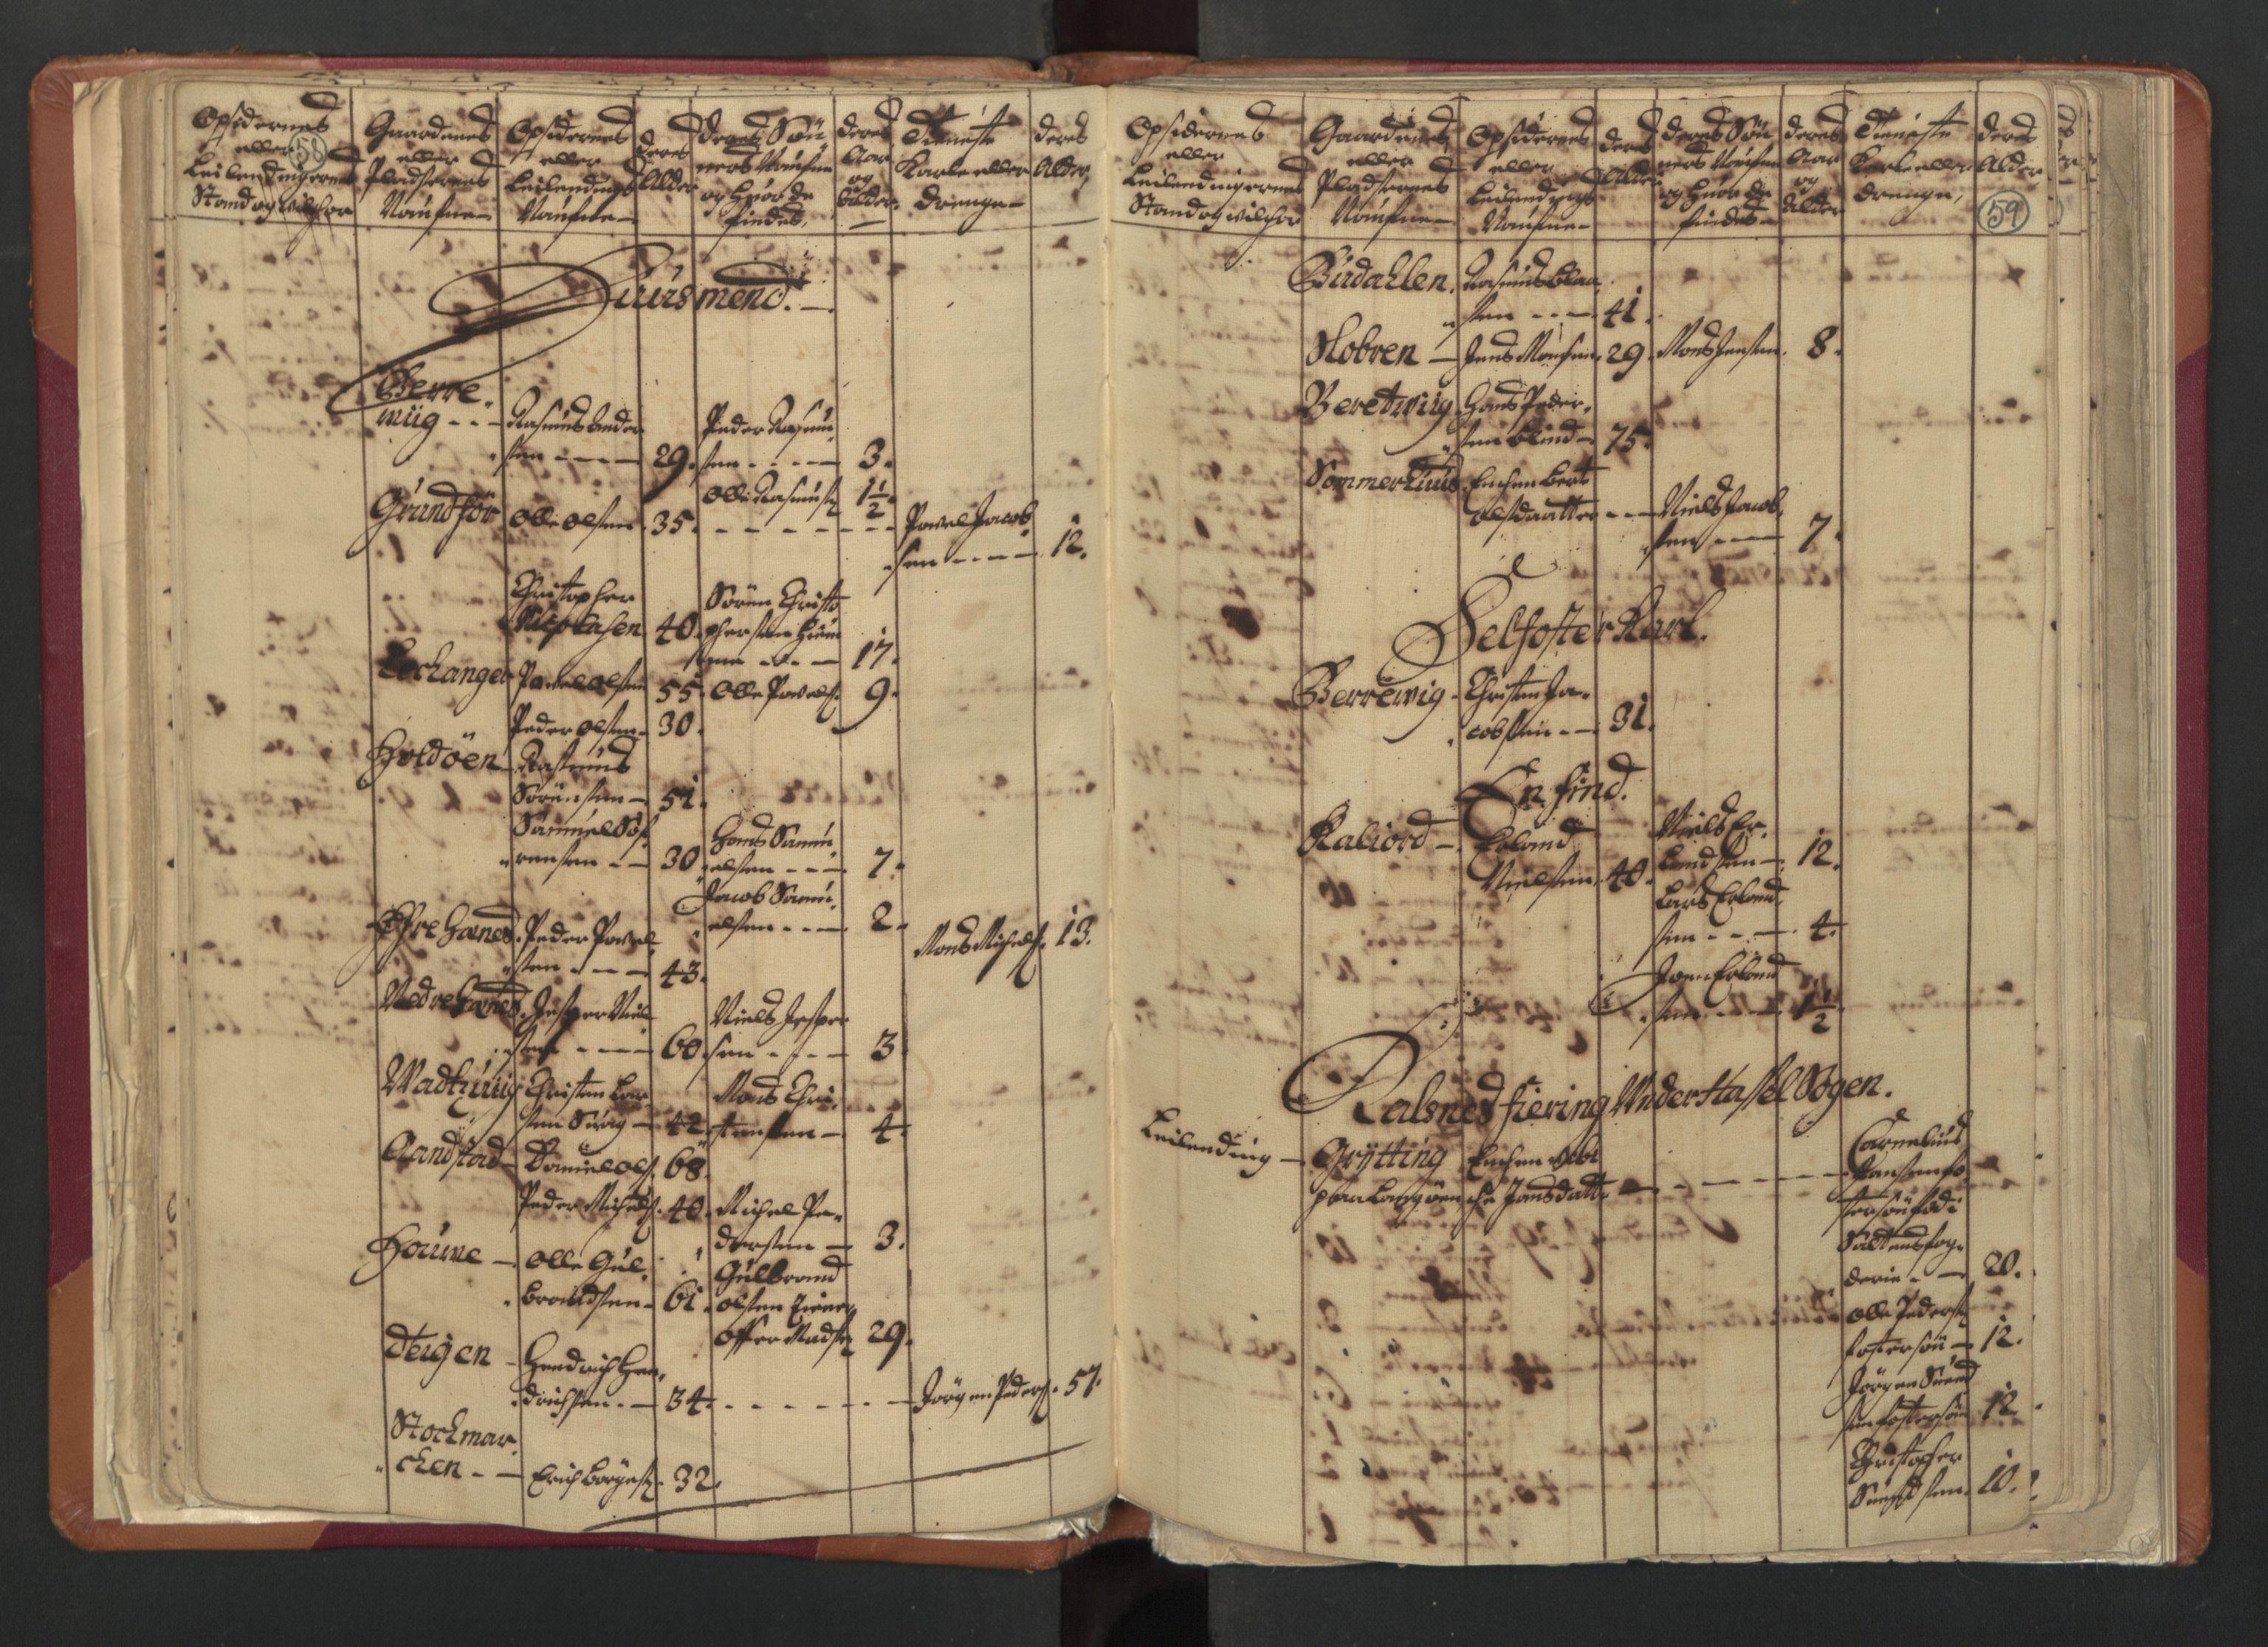 RA, Manntallet 1701, nr. 18: Vesterålen, Andenes og Lofoten fogderi, 1701, s. 58-59